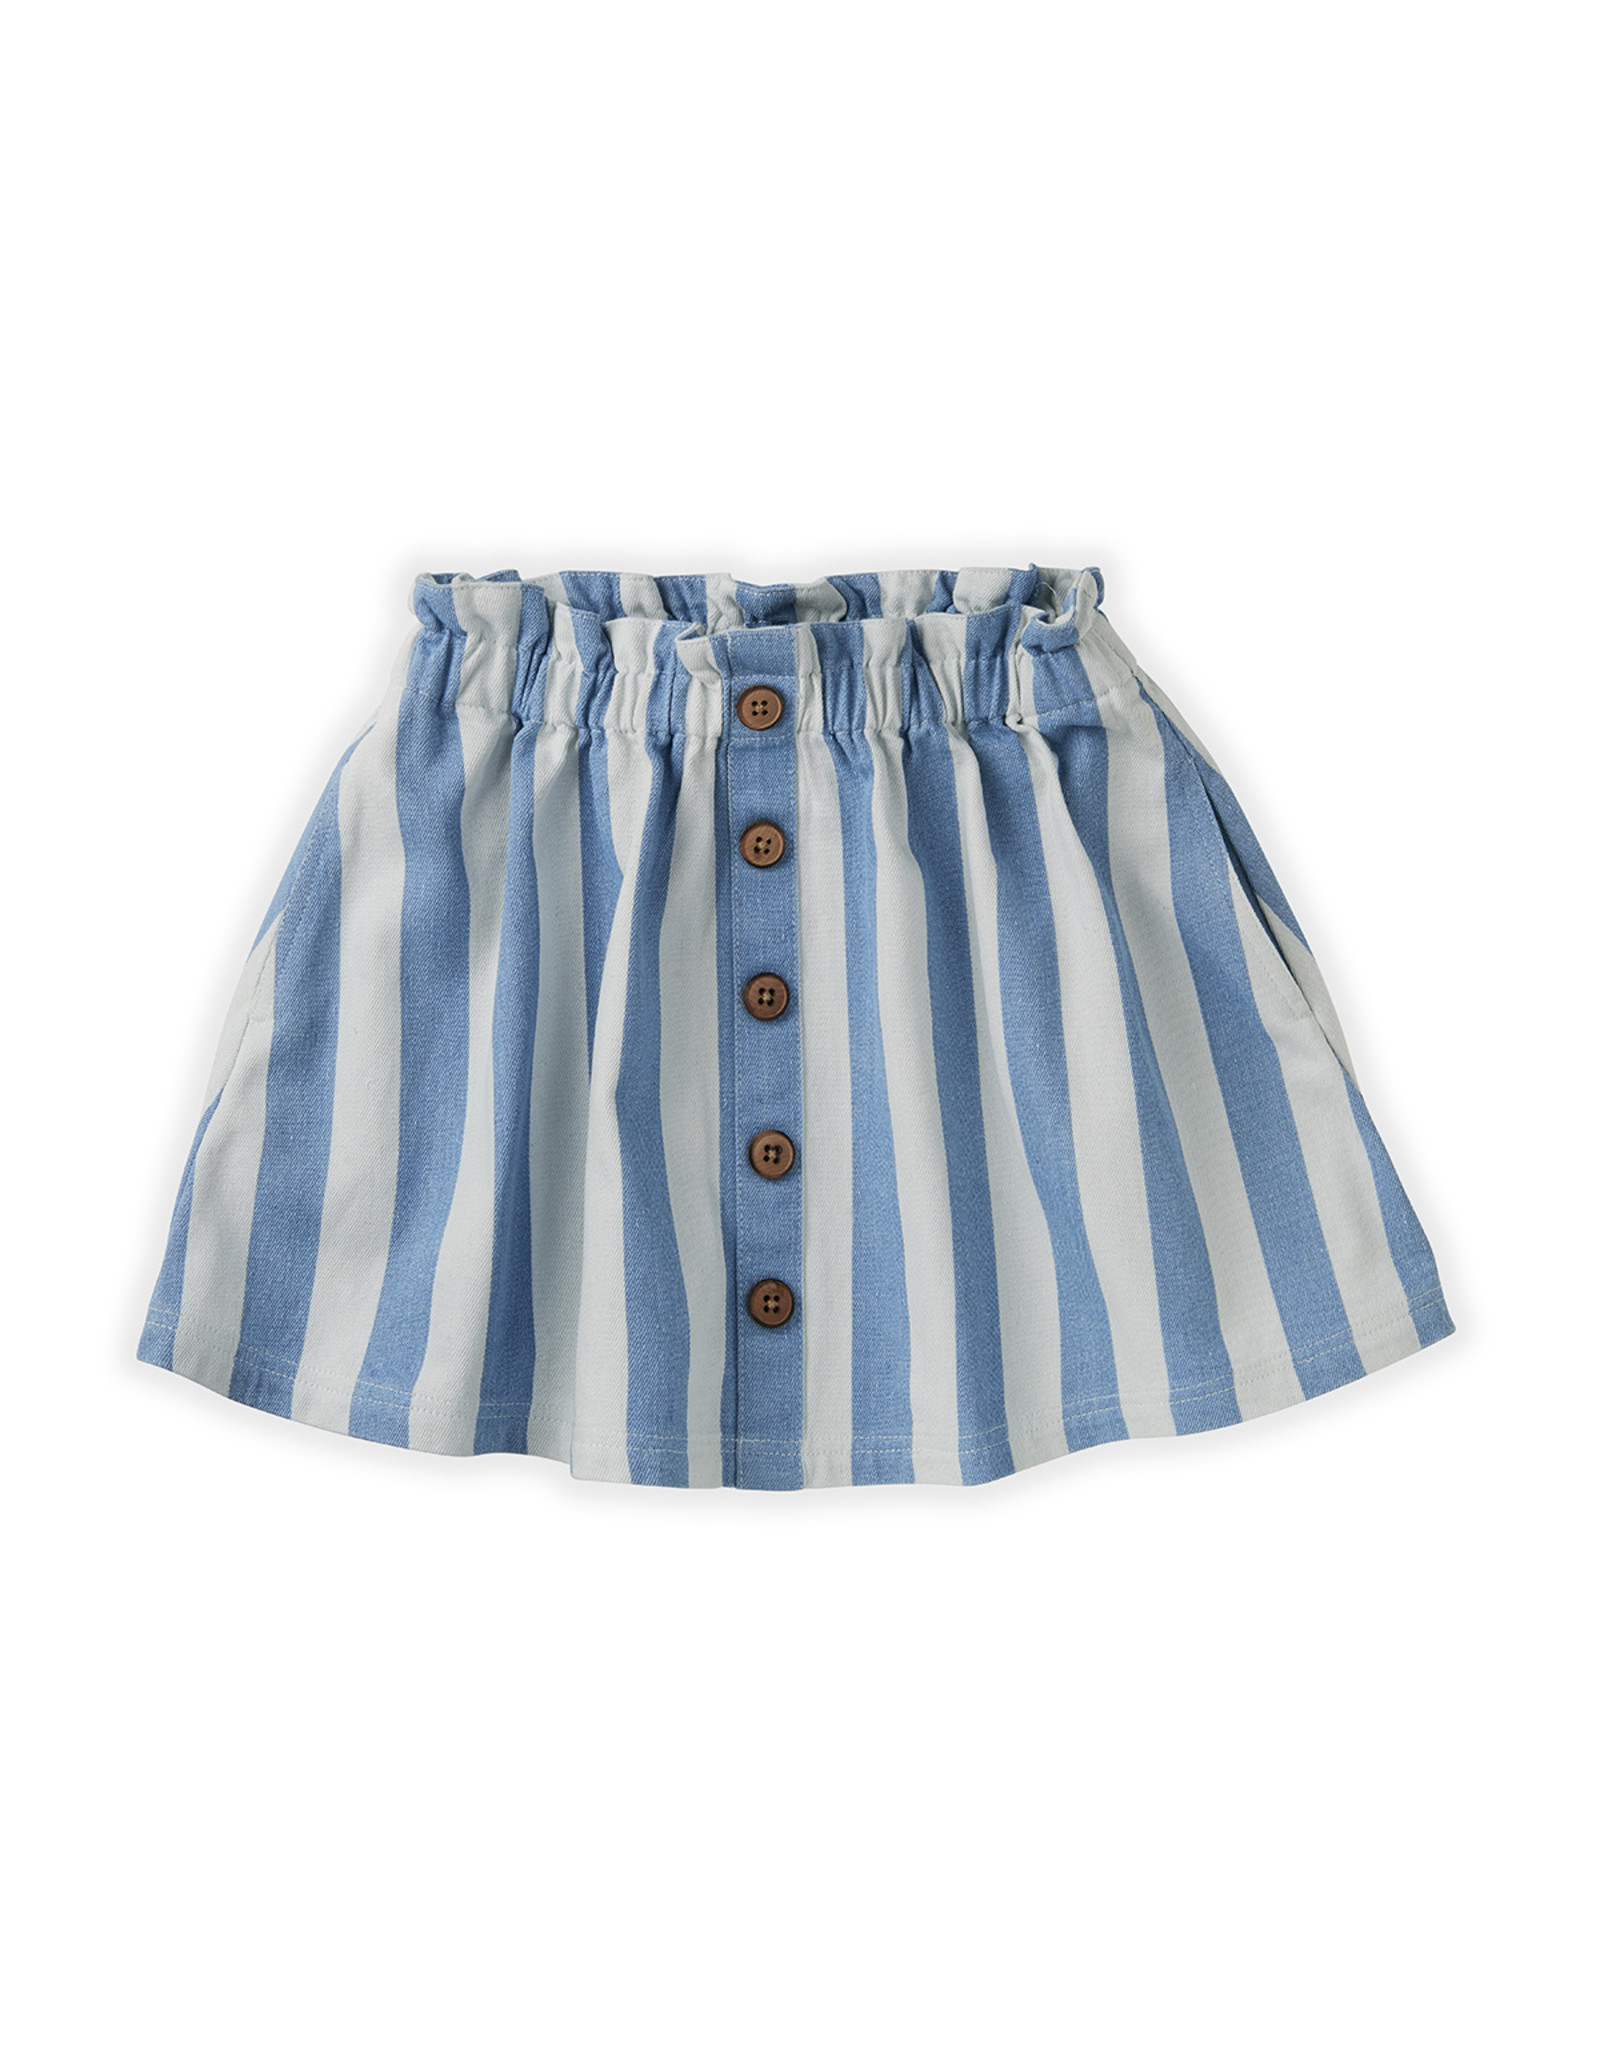 Sproet & Sprout SS - Skirt Denim Stripe